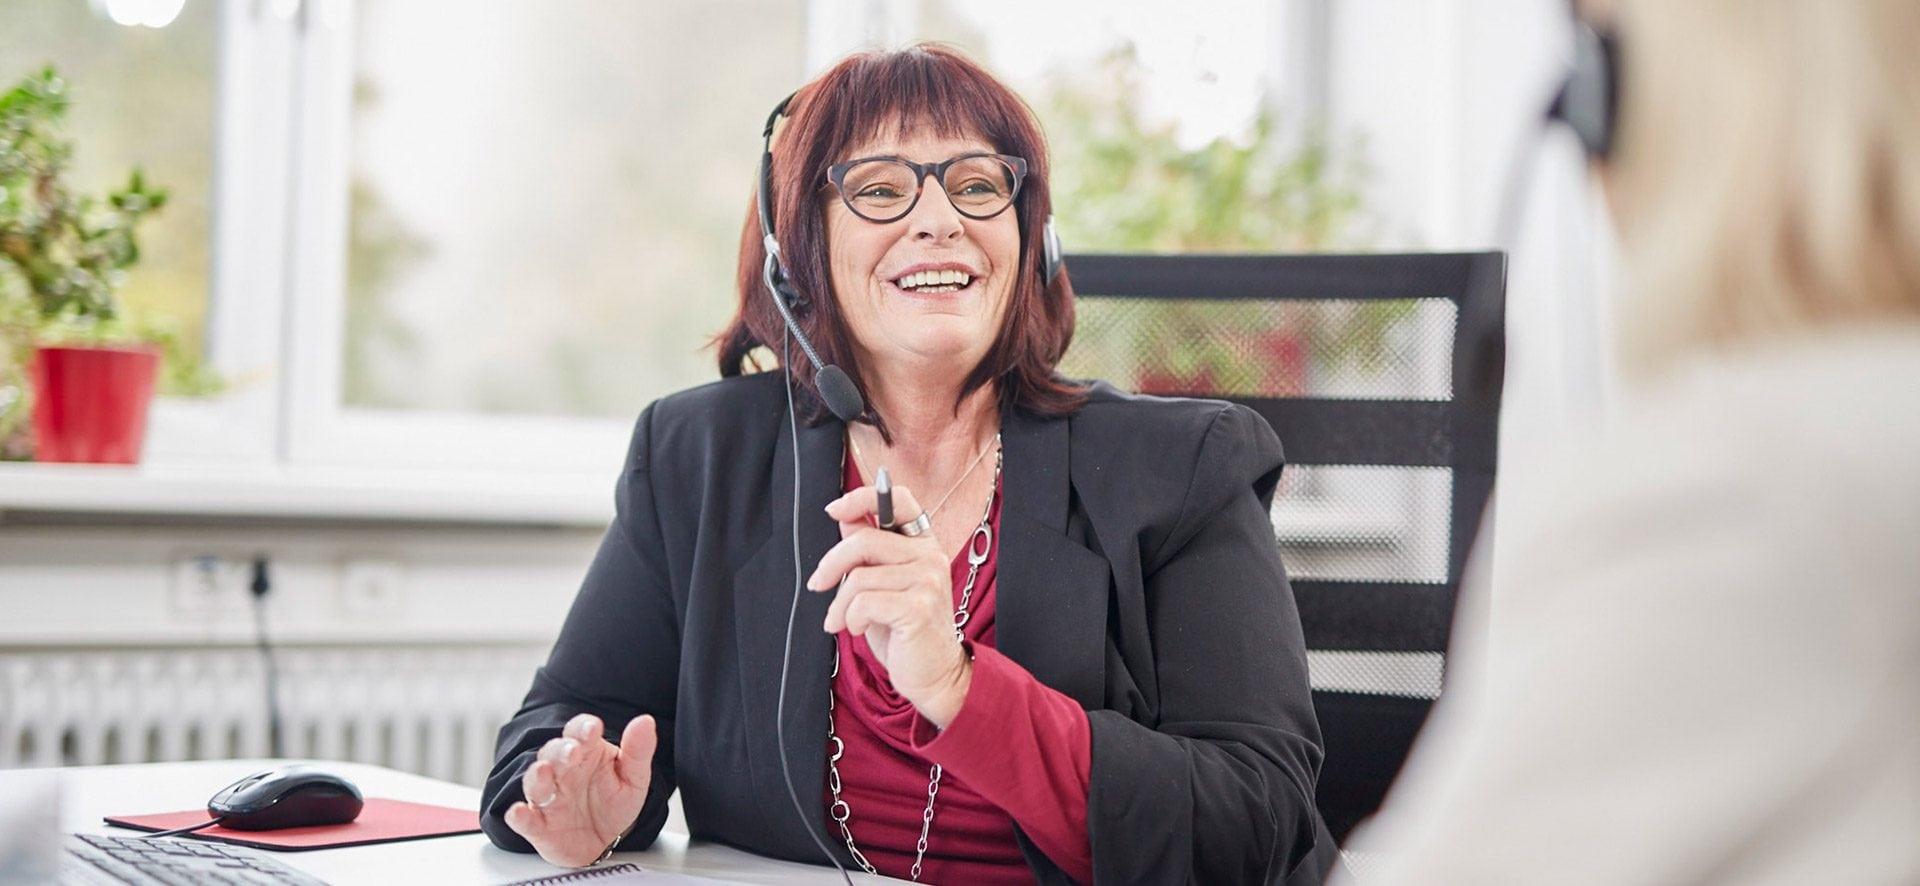 Kunden Akquise Frau Headset lacht